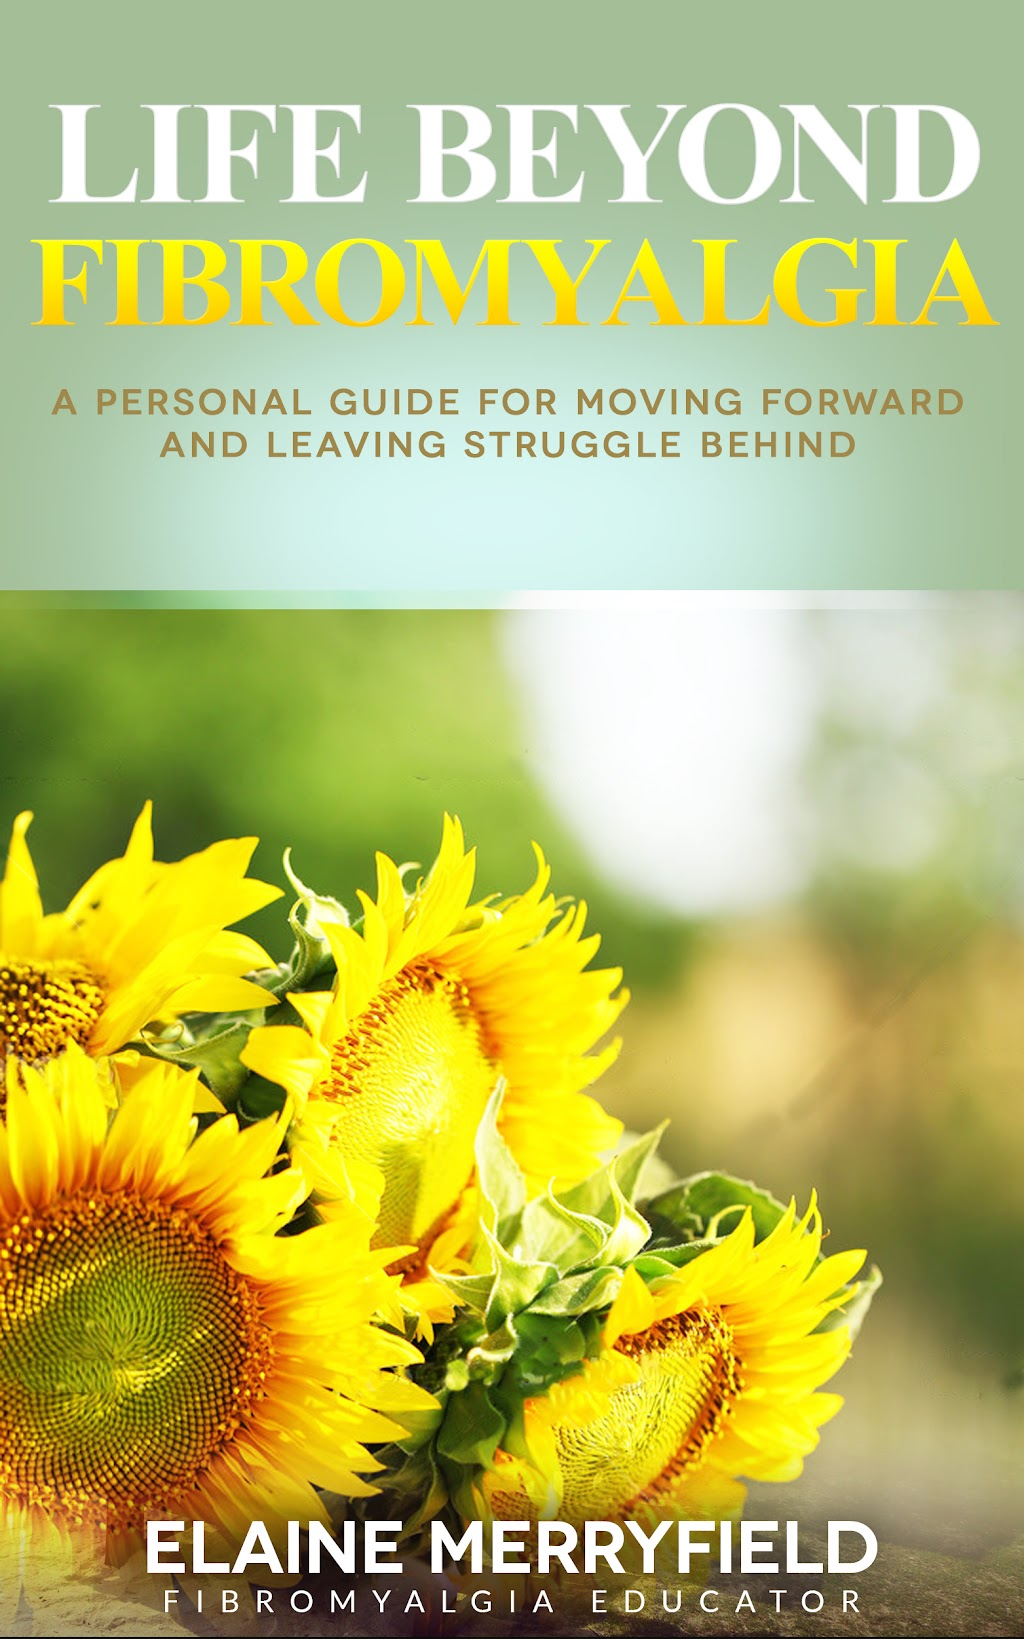 Life Beyond Fibromyalgia cover